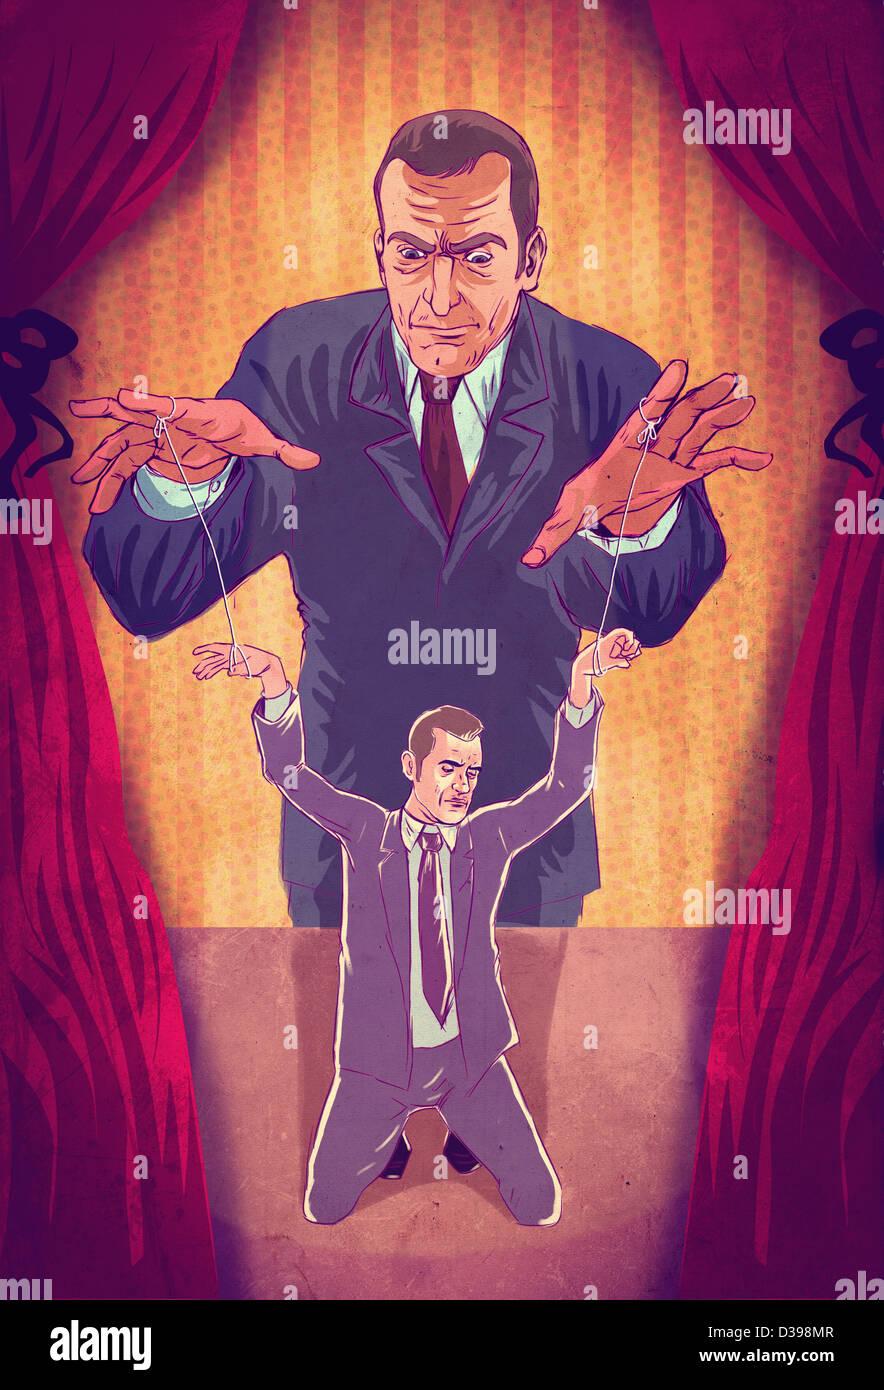 Concepto ilustrativa de jefe ejecutivo controlan marionetas Imagen De Stock